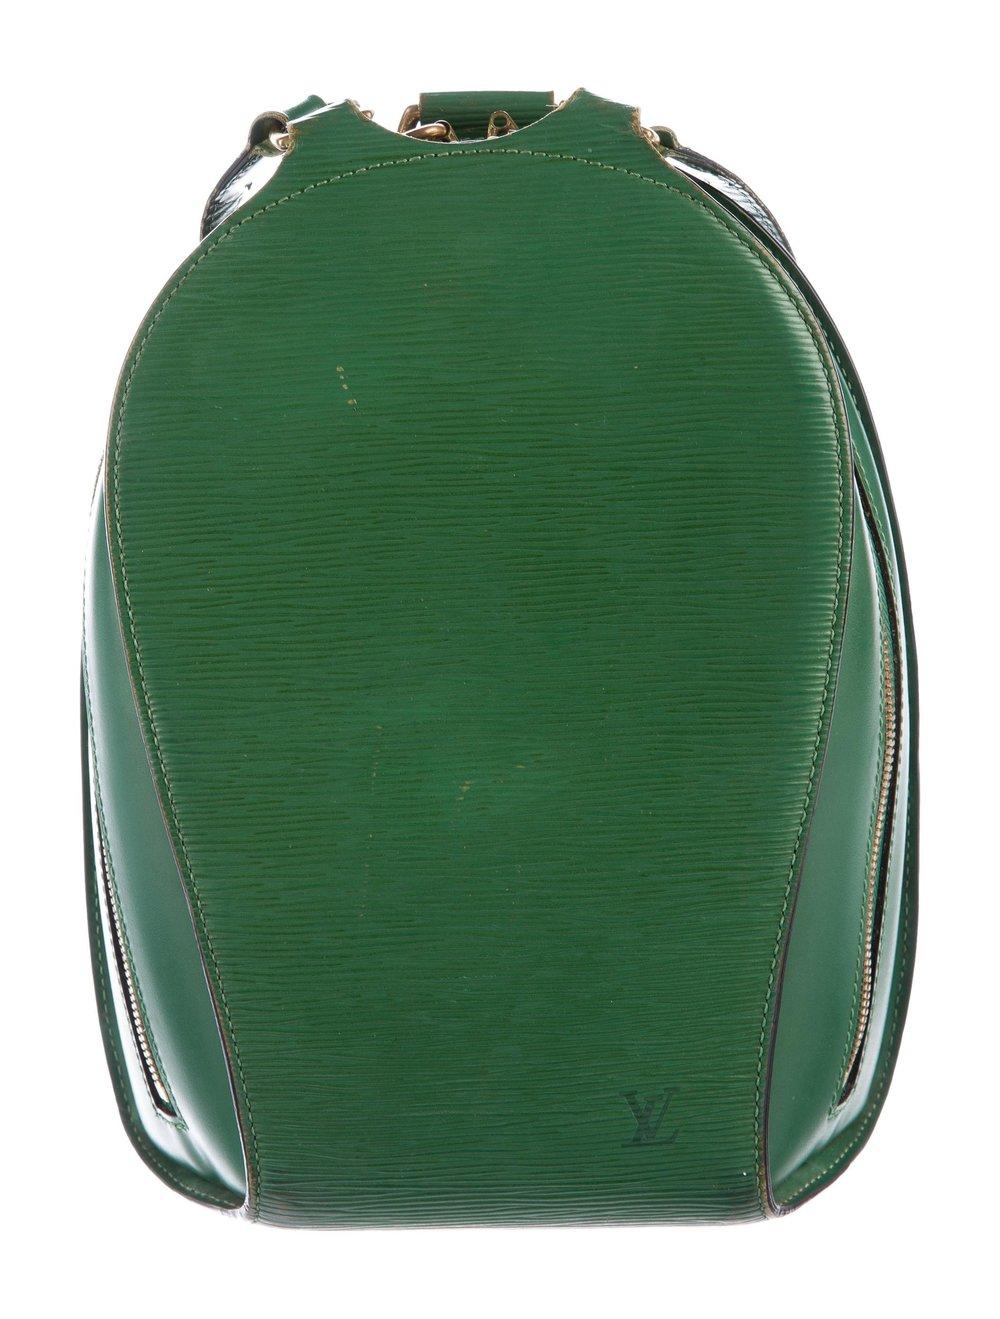 LOUIS VUITTON    Epi Mabillon Backpack, $600, therealreal.com